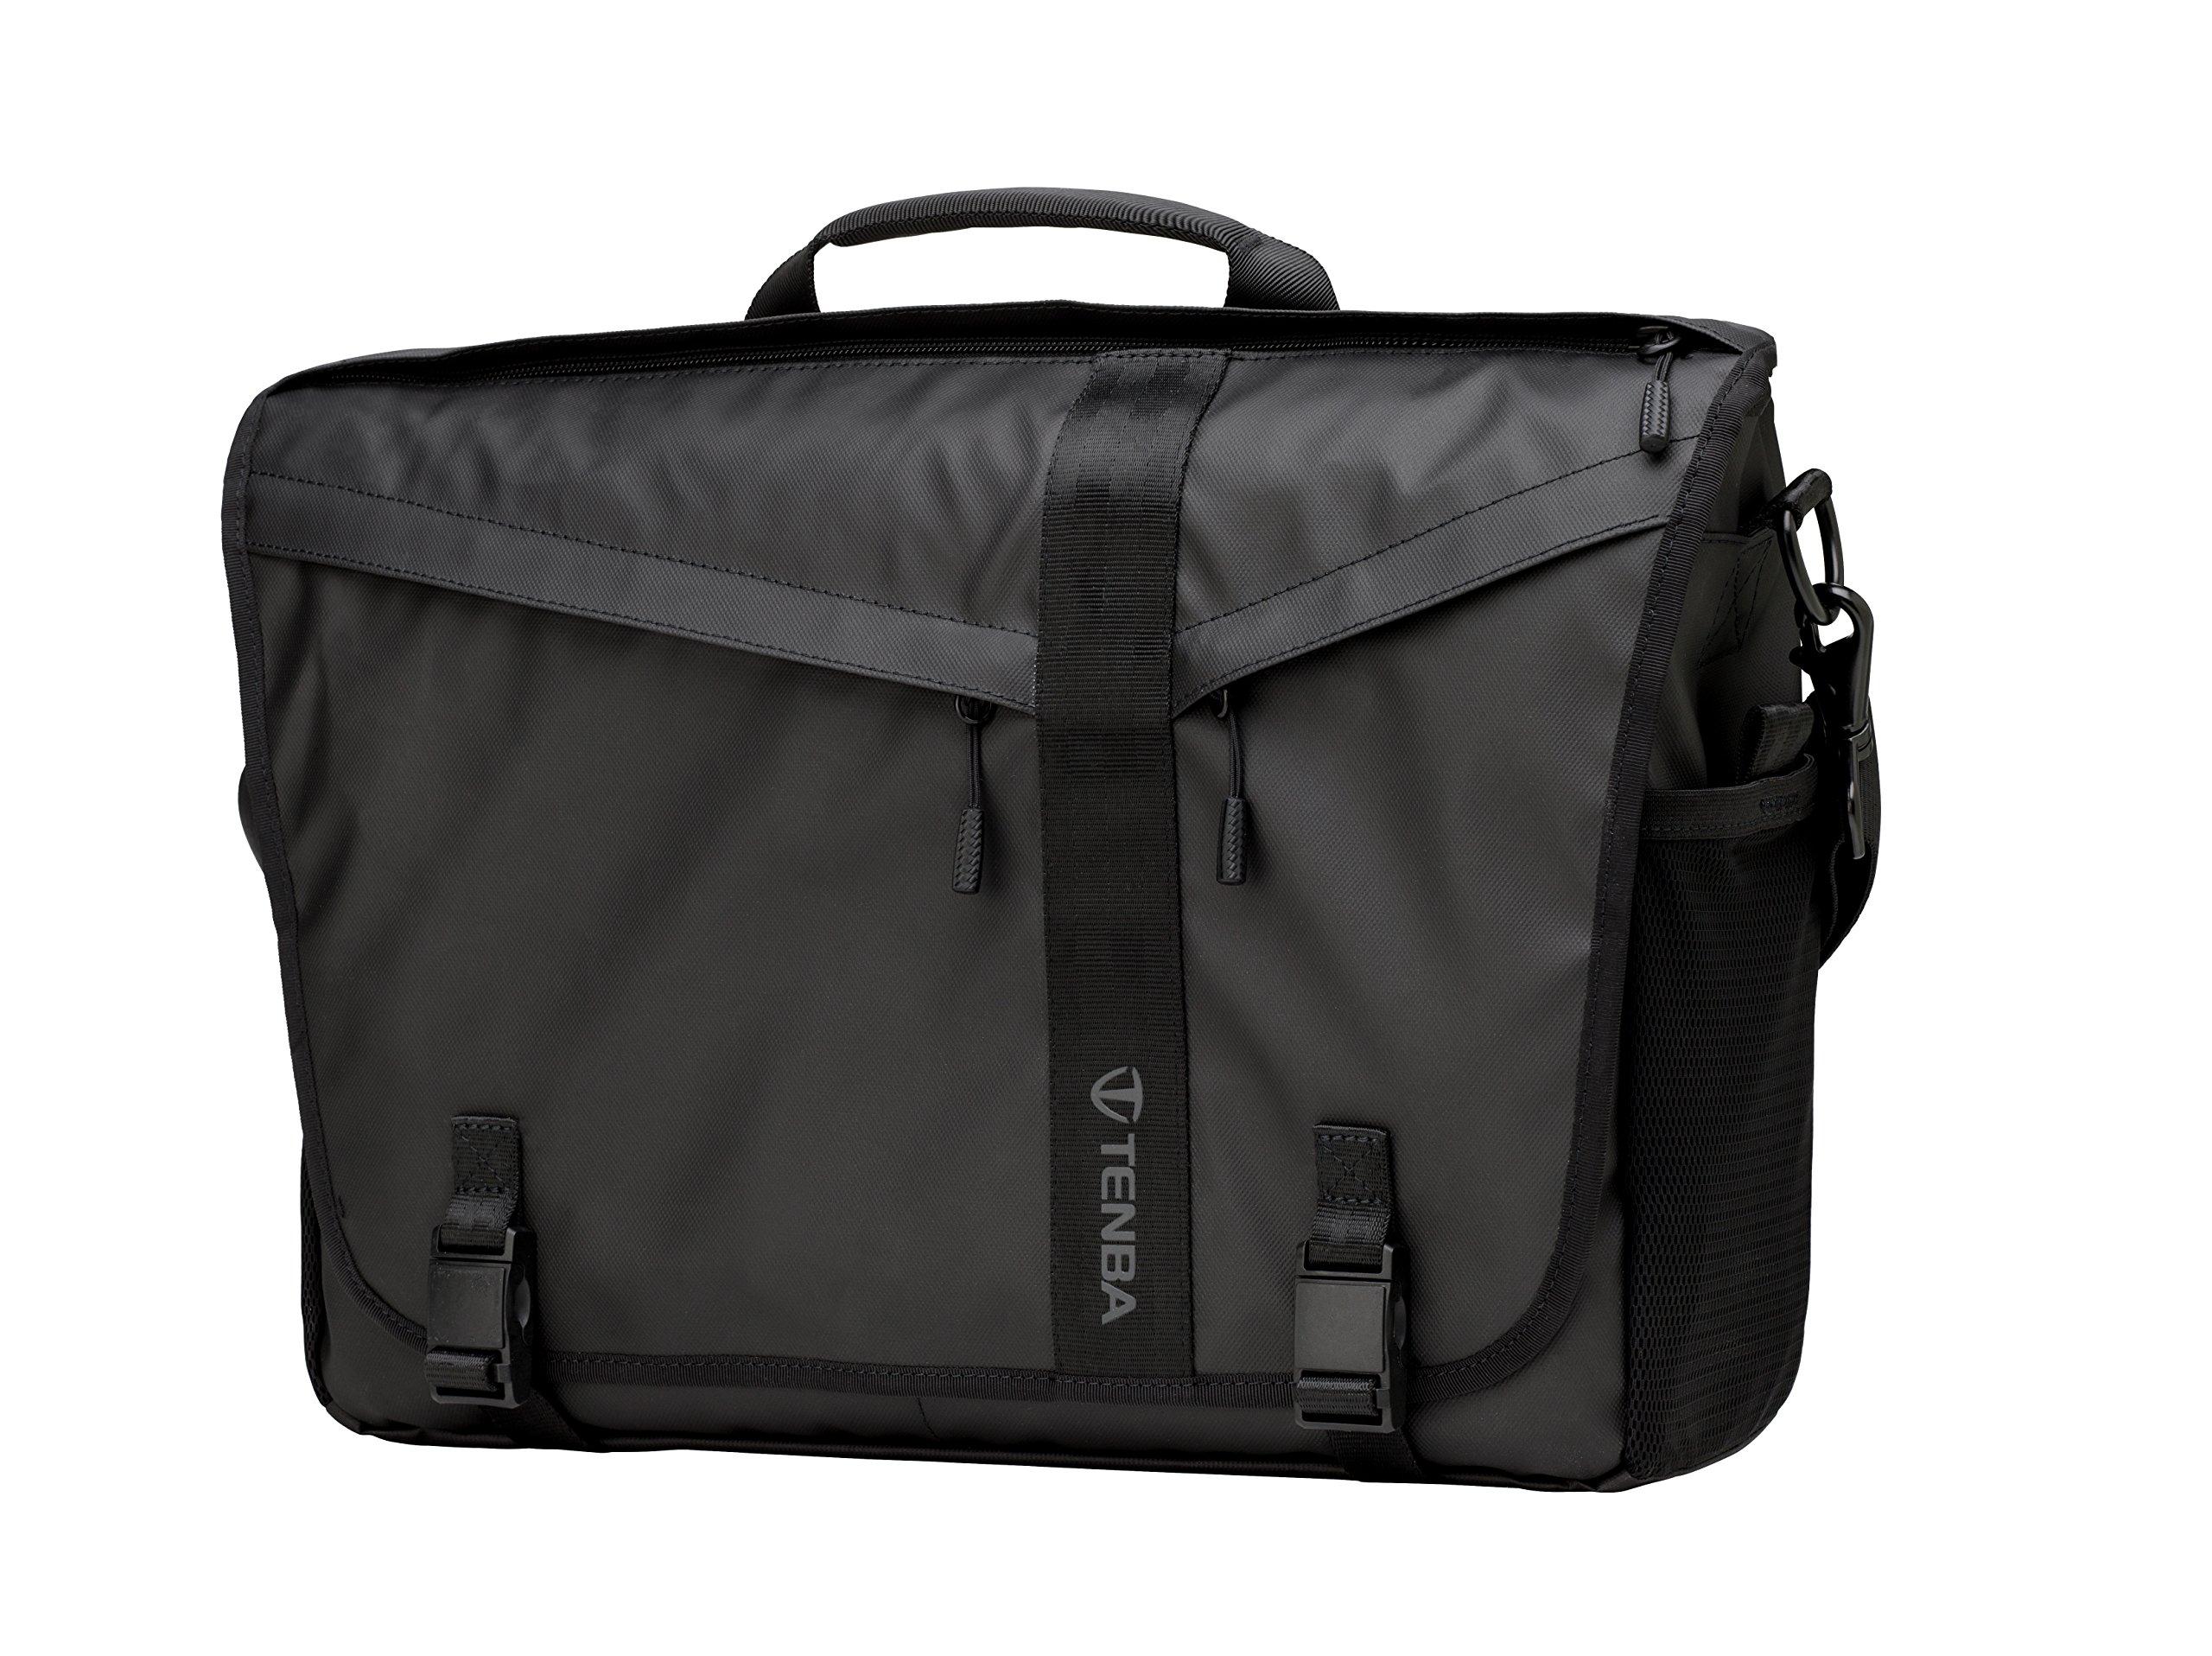 Tenba DNA 15 Slim Messenger Bag - Special Edition (638-485)